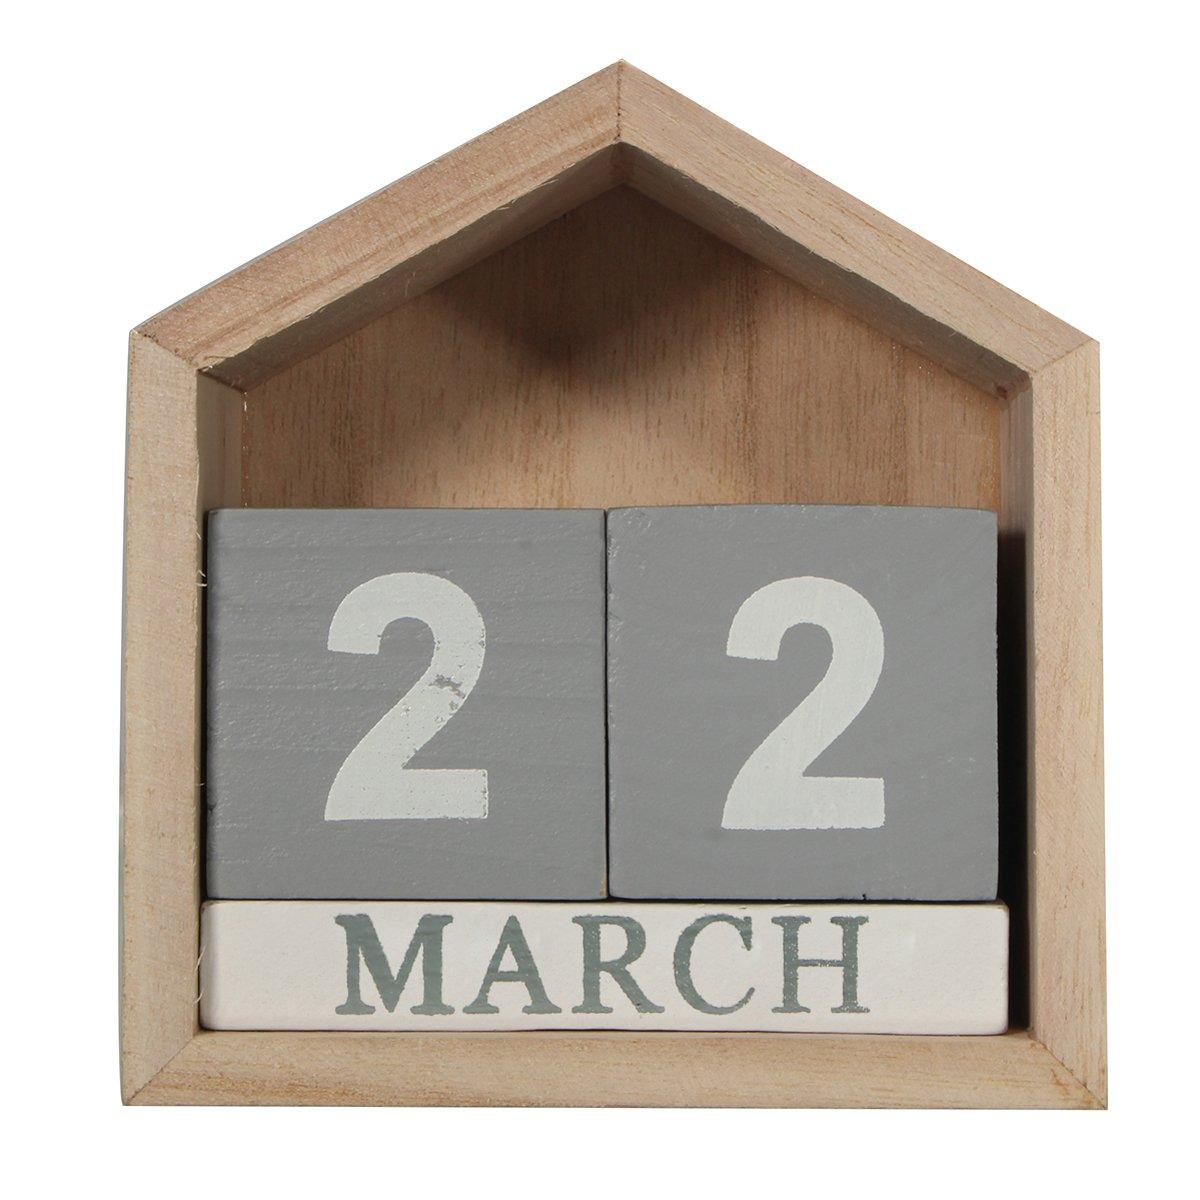 Jeteven Vintage Wood Perpetual Calendar, Shabby Chic Blocks Calendar Home Office Desktop Decoration, Grey, 4.33''X2.17''X4.53''